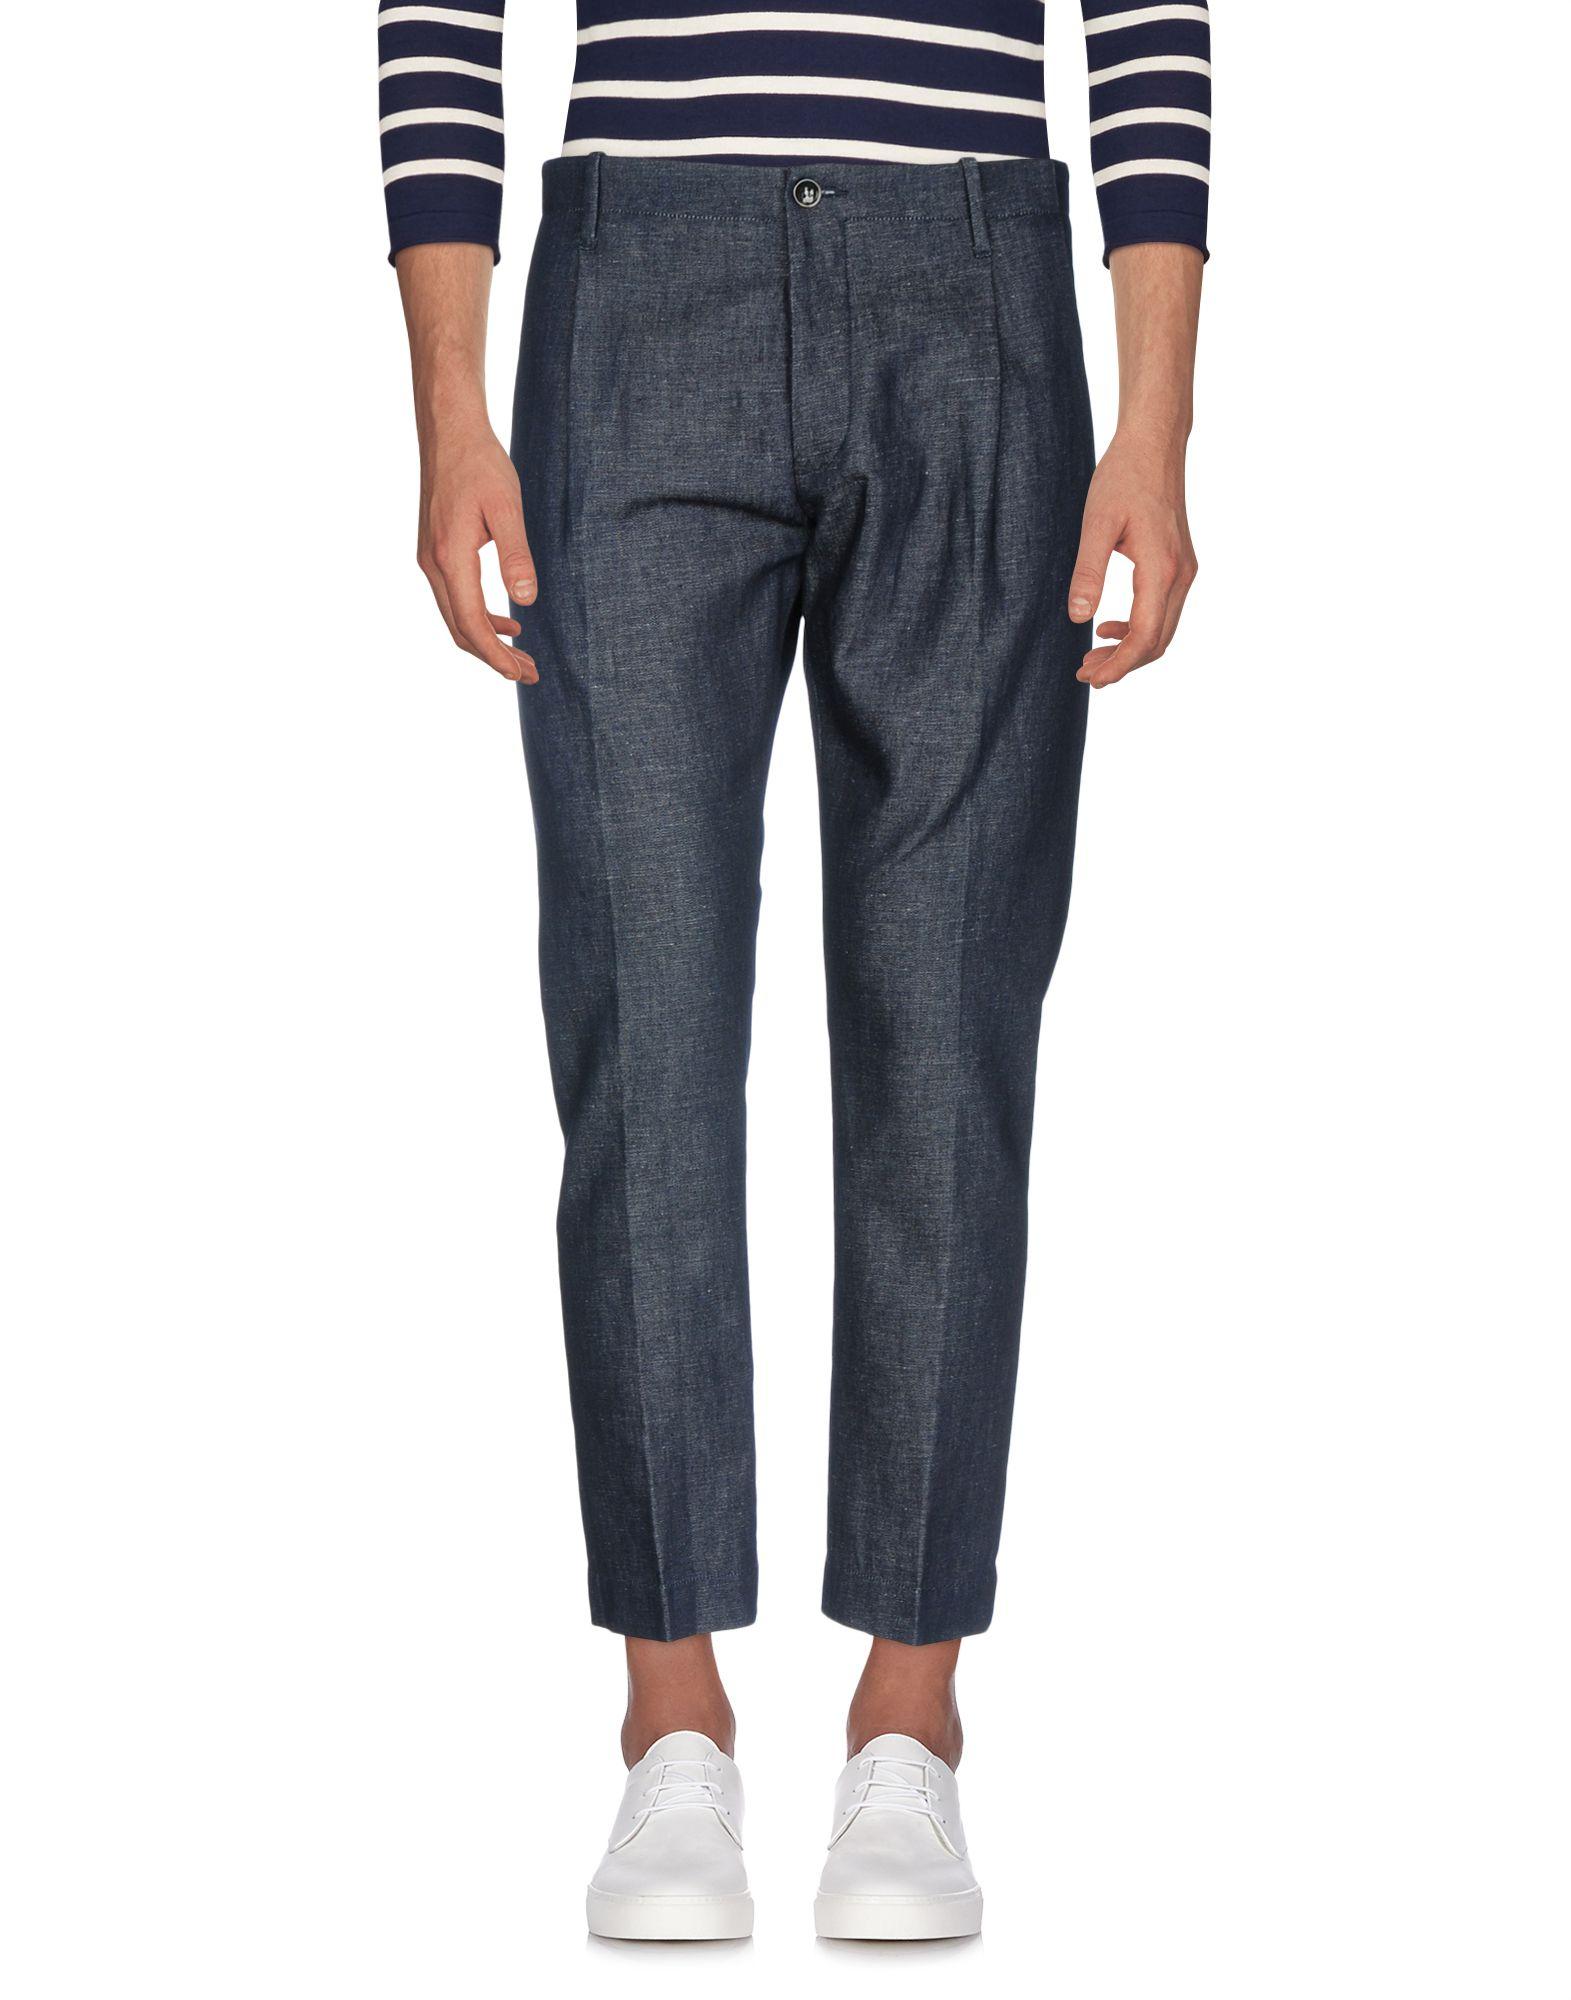 NINE: INTHE: MORNING Denim pants - Item 42661390